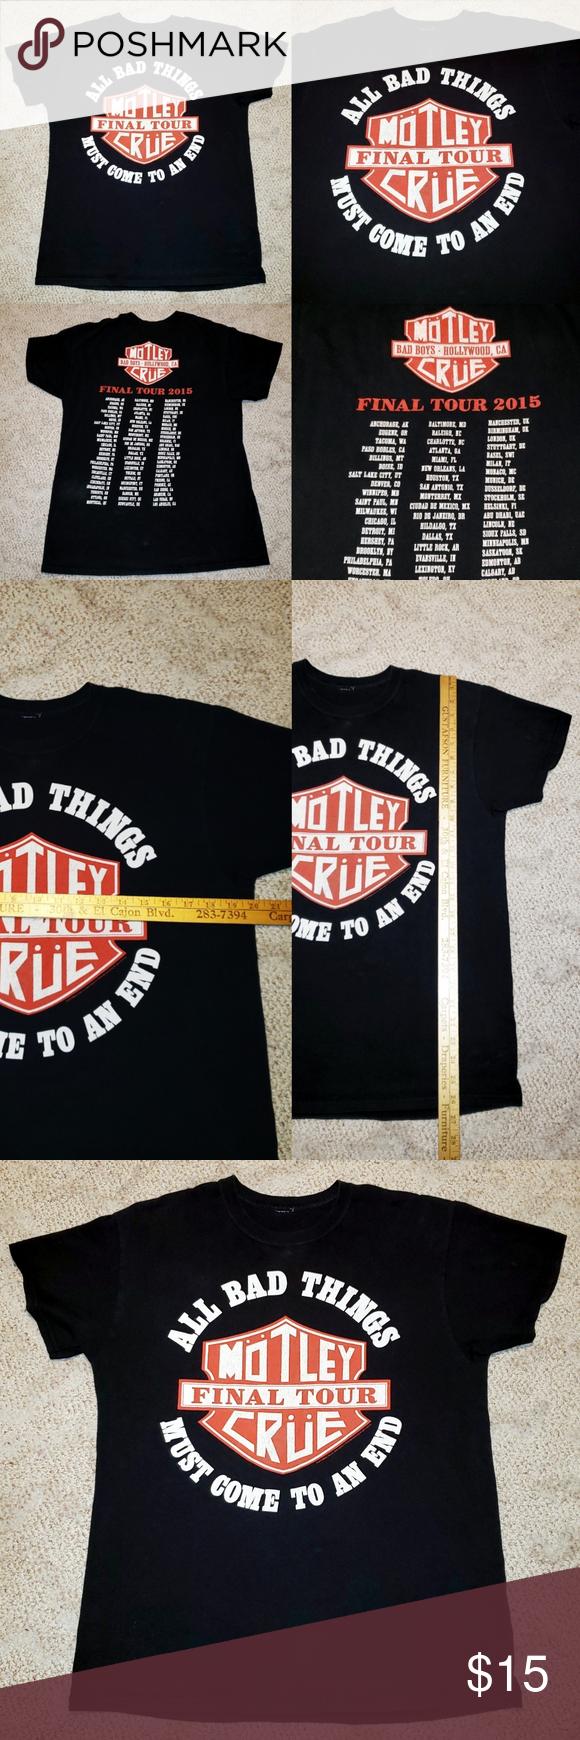 Sold Motley Crue 2015 Concert Tour Rock Band Tee Rock Band Tees Motley Crue Band Tees